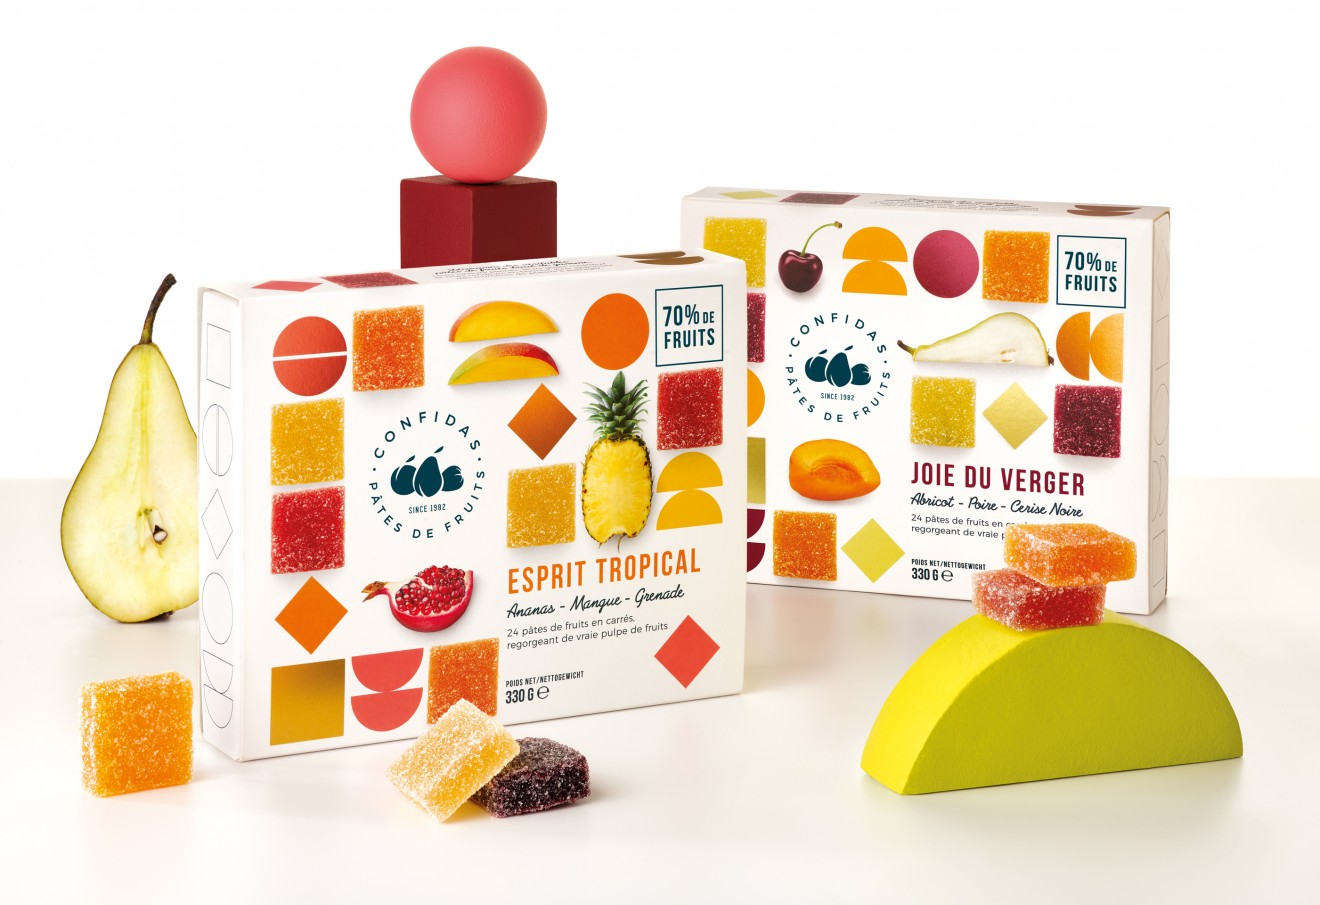 Quatre Mains package design - orb, pear, fruit jelly